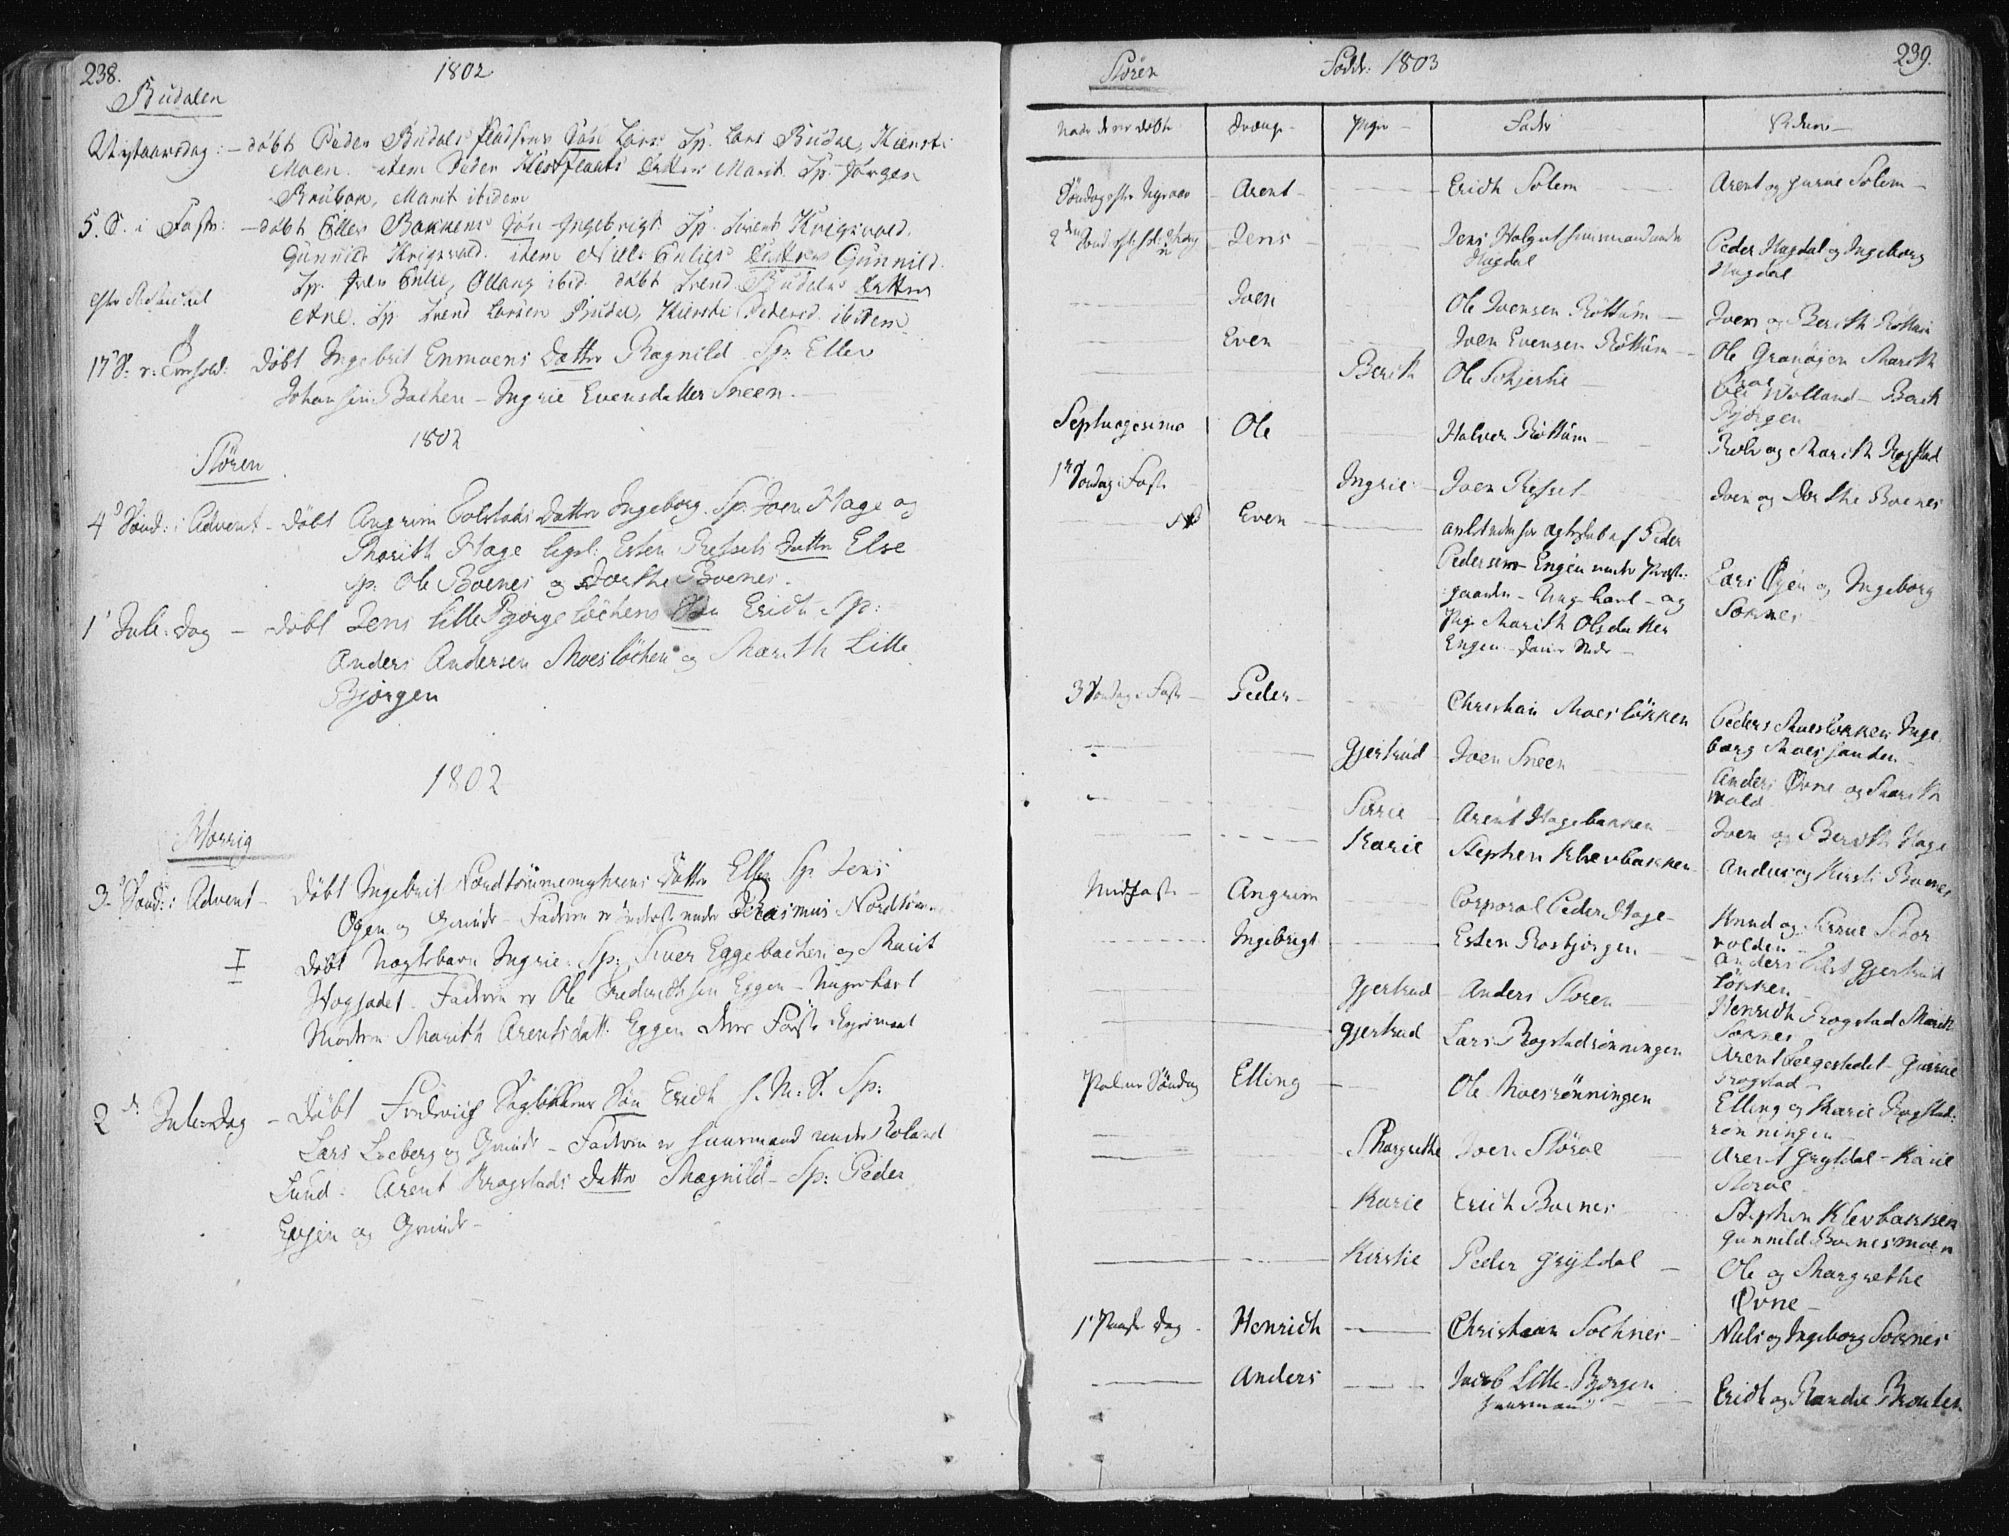 SAT, Ministerialprotokoller, klokkerbøker og fødselsregistre - Sør-Trøndelag, 687/L0992: Parish register (official) no. 687A03 /1, 1788-1815, p. 238-239